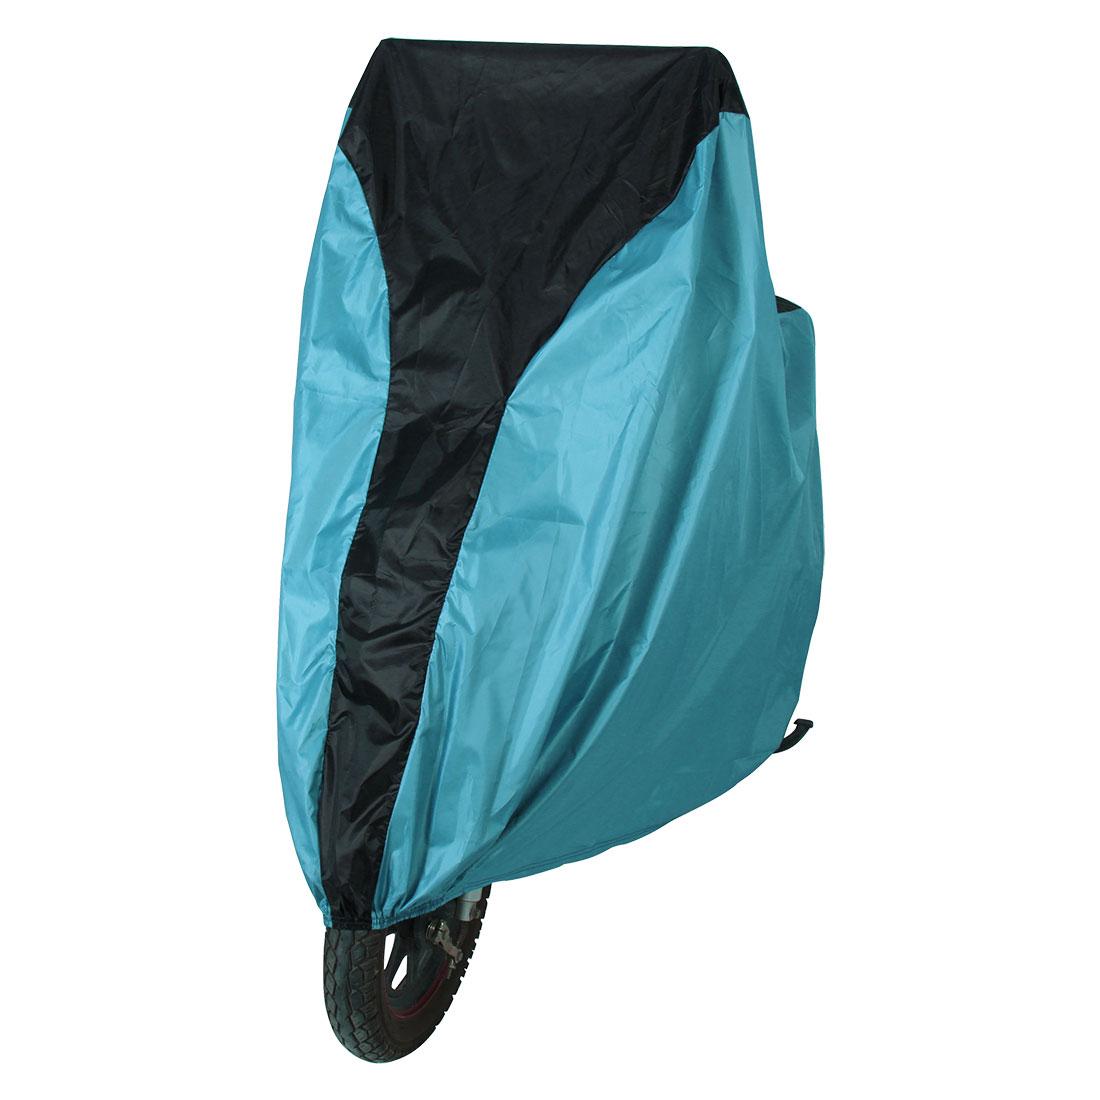 Outdoor Bicycle Bike Cover Rain Protector Anti-UV Garage Storage L Light Blue